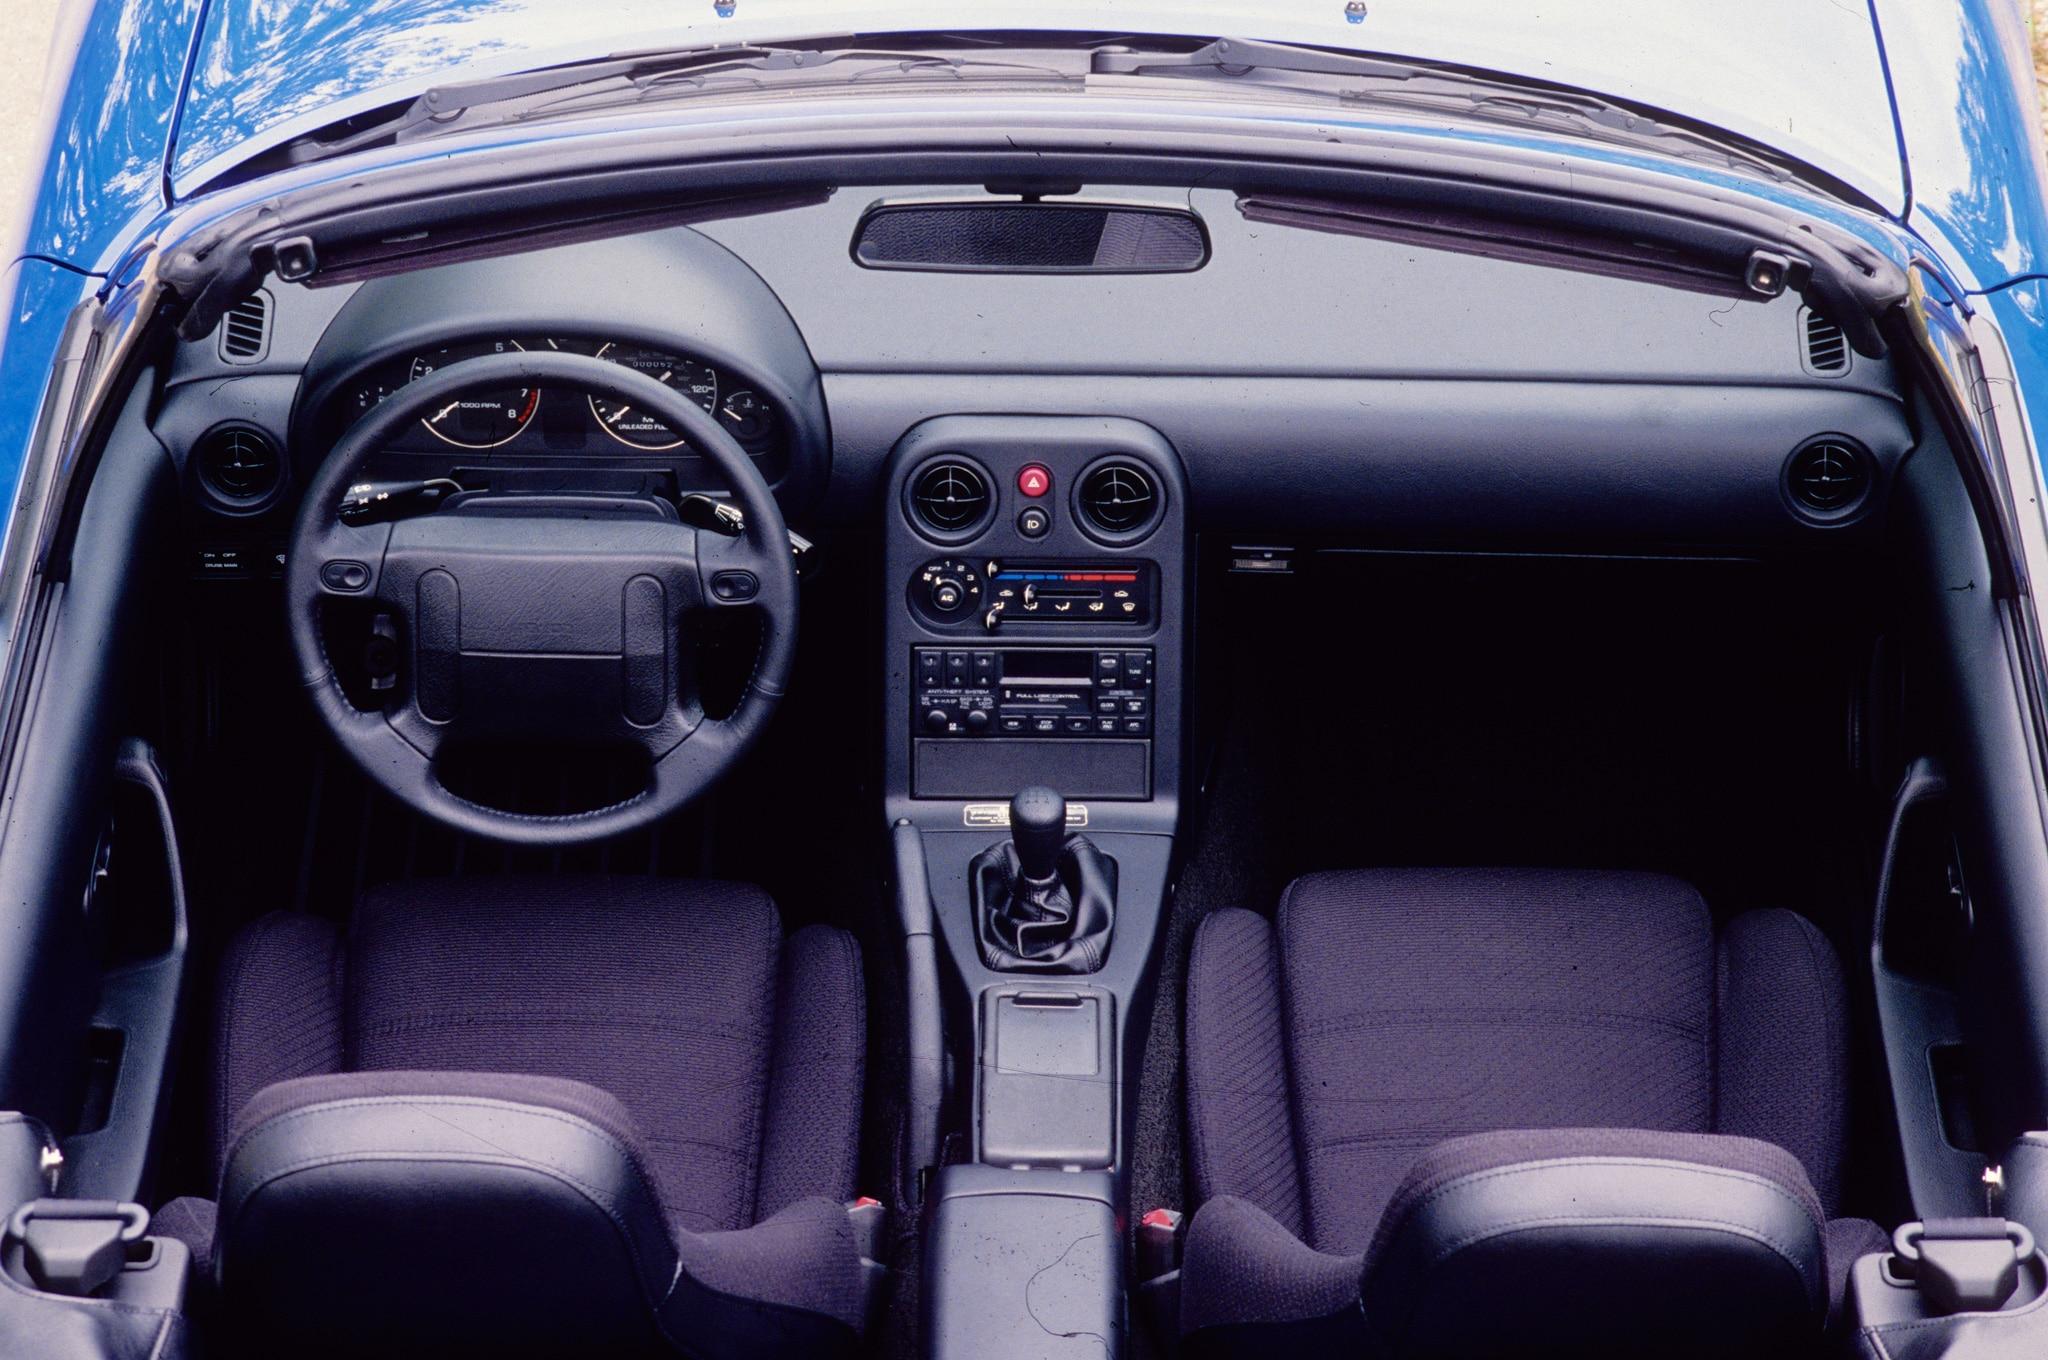 1990 Mazda Mx 5 Miata Review